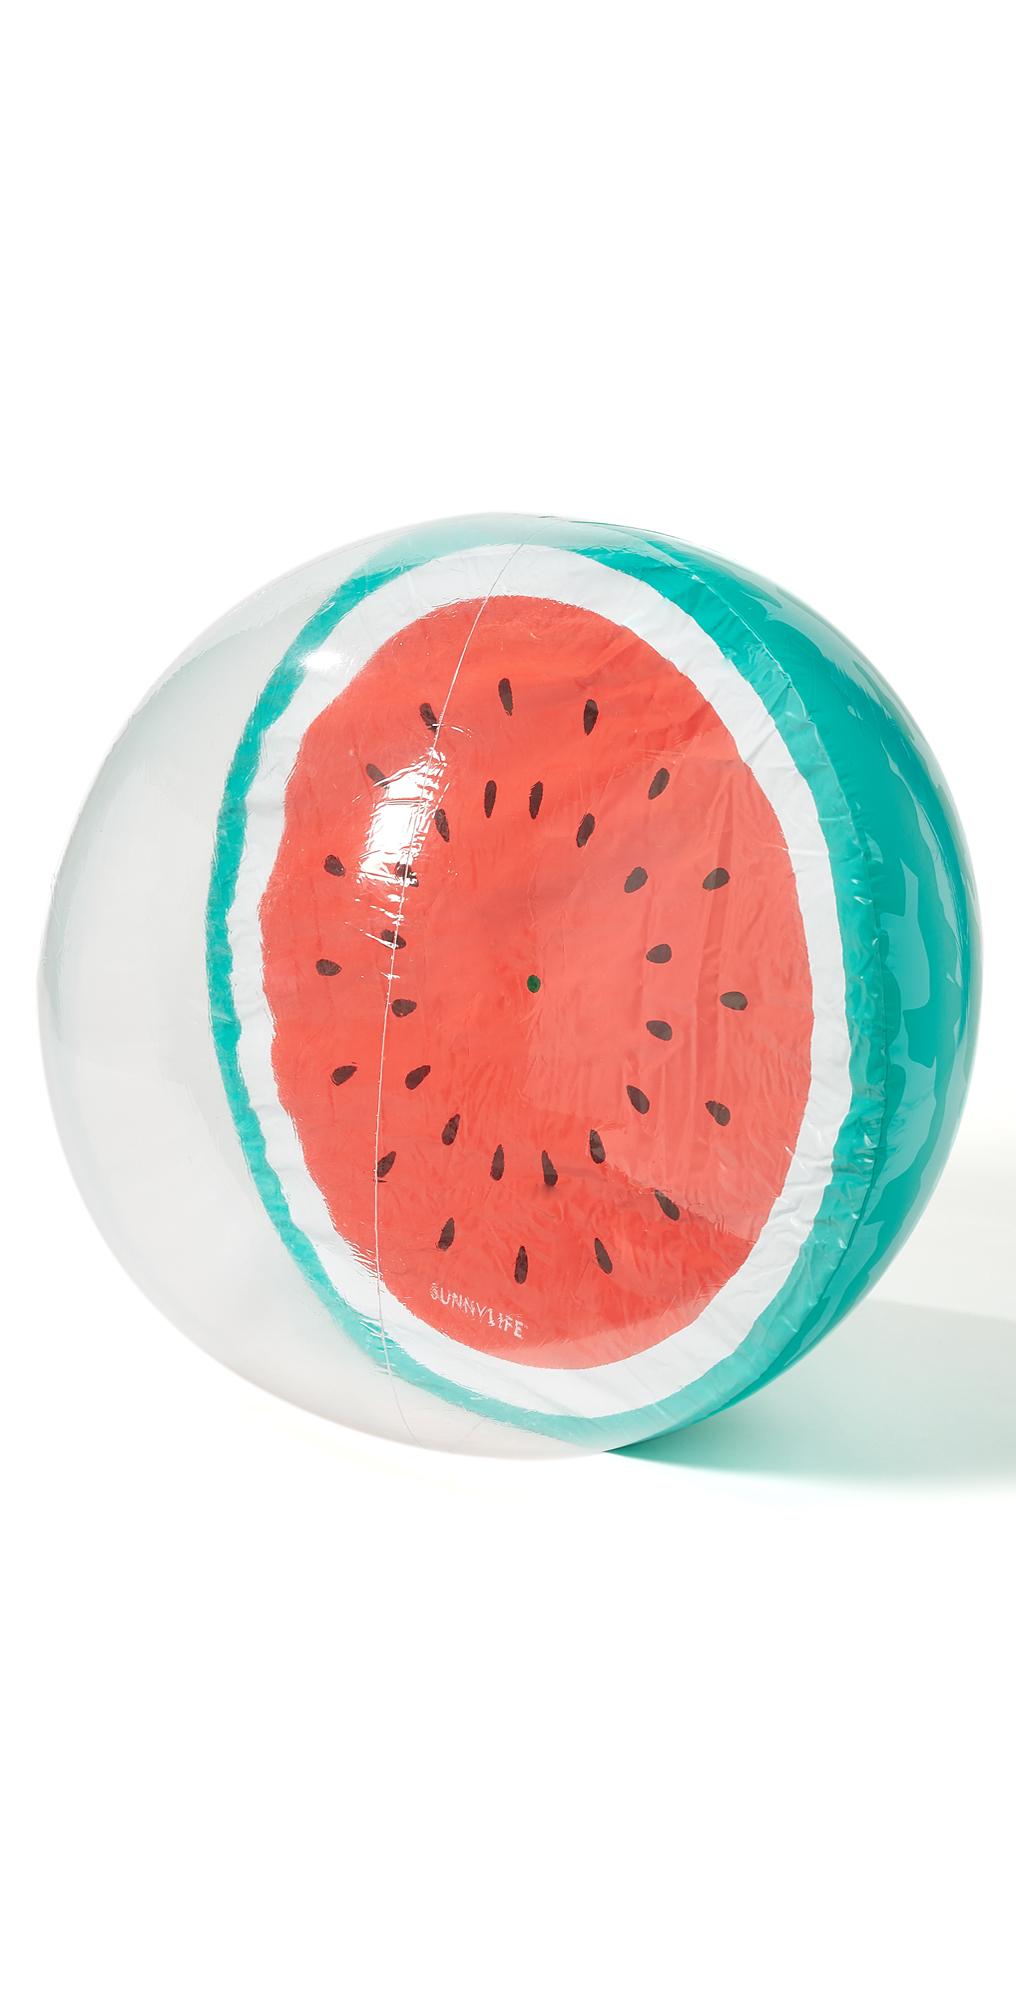 XL Inflatable Watermelon Beach Ball SunnyLife